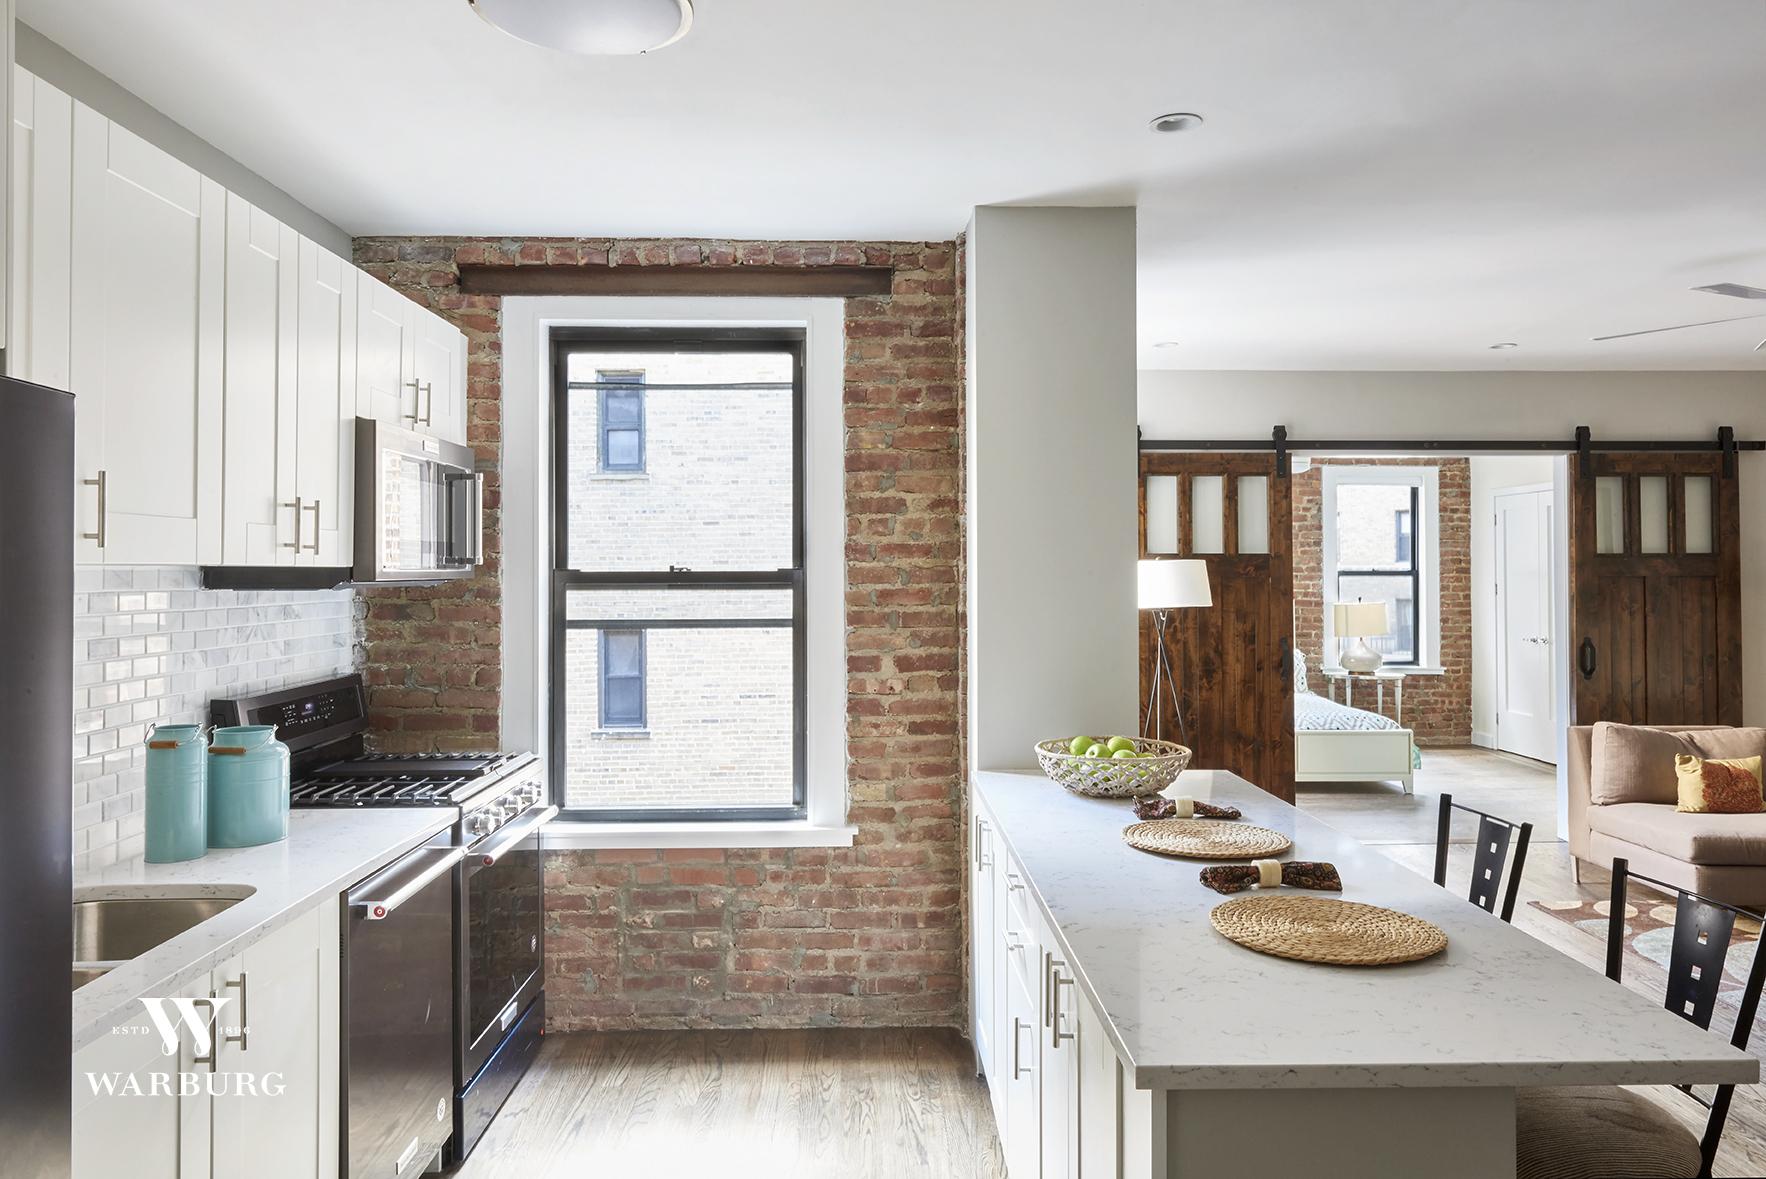 Kiva Kitchen & Bath - Kitchen Ideas